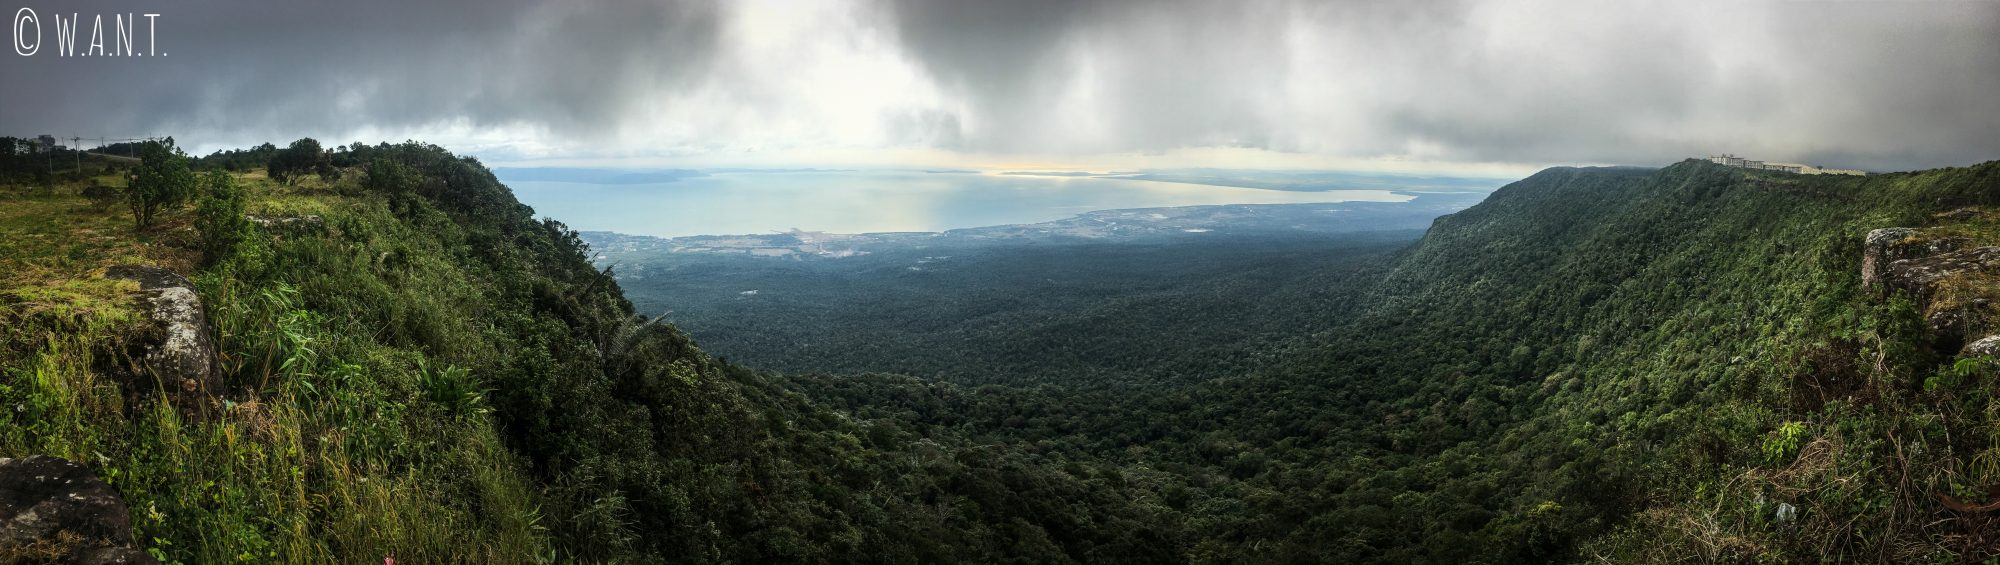 Panorama depuis Bokor Hill Station, en haut du Parc national de Bokor